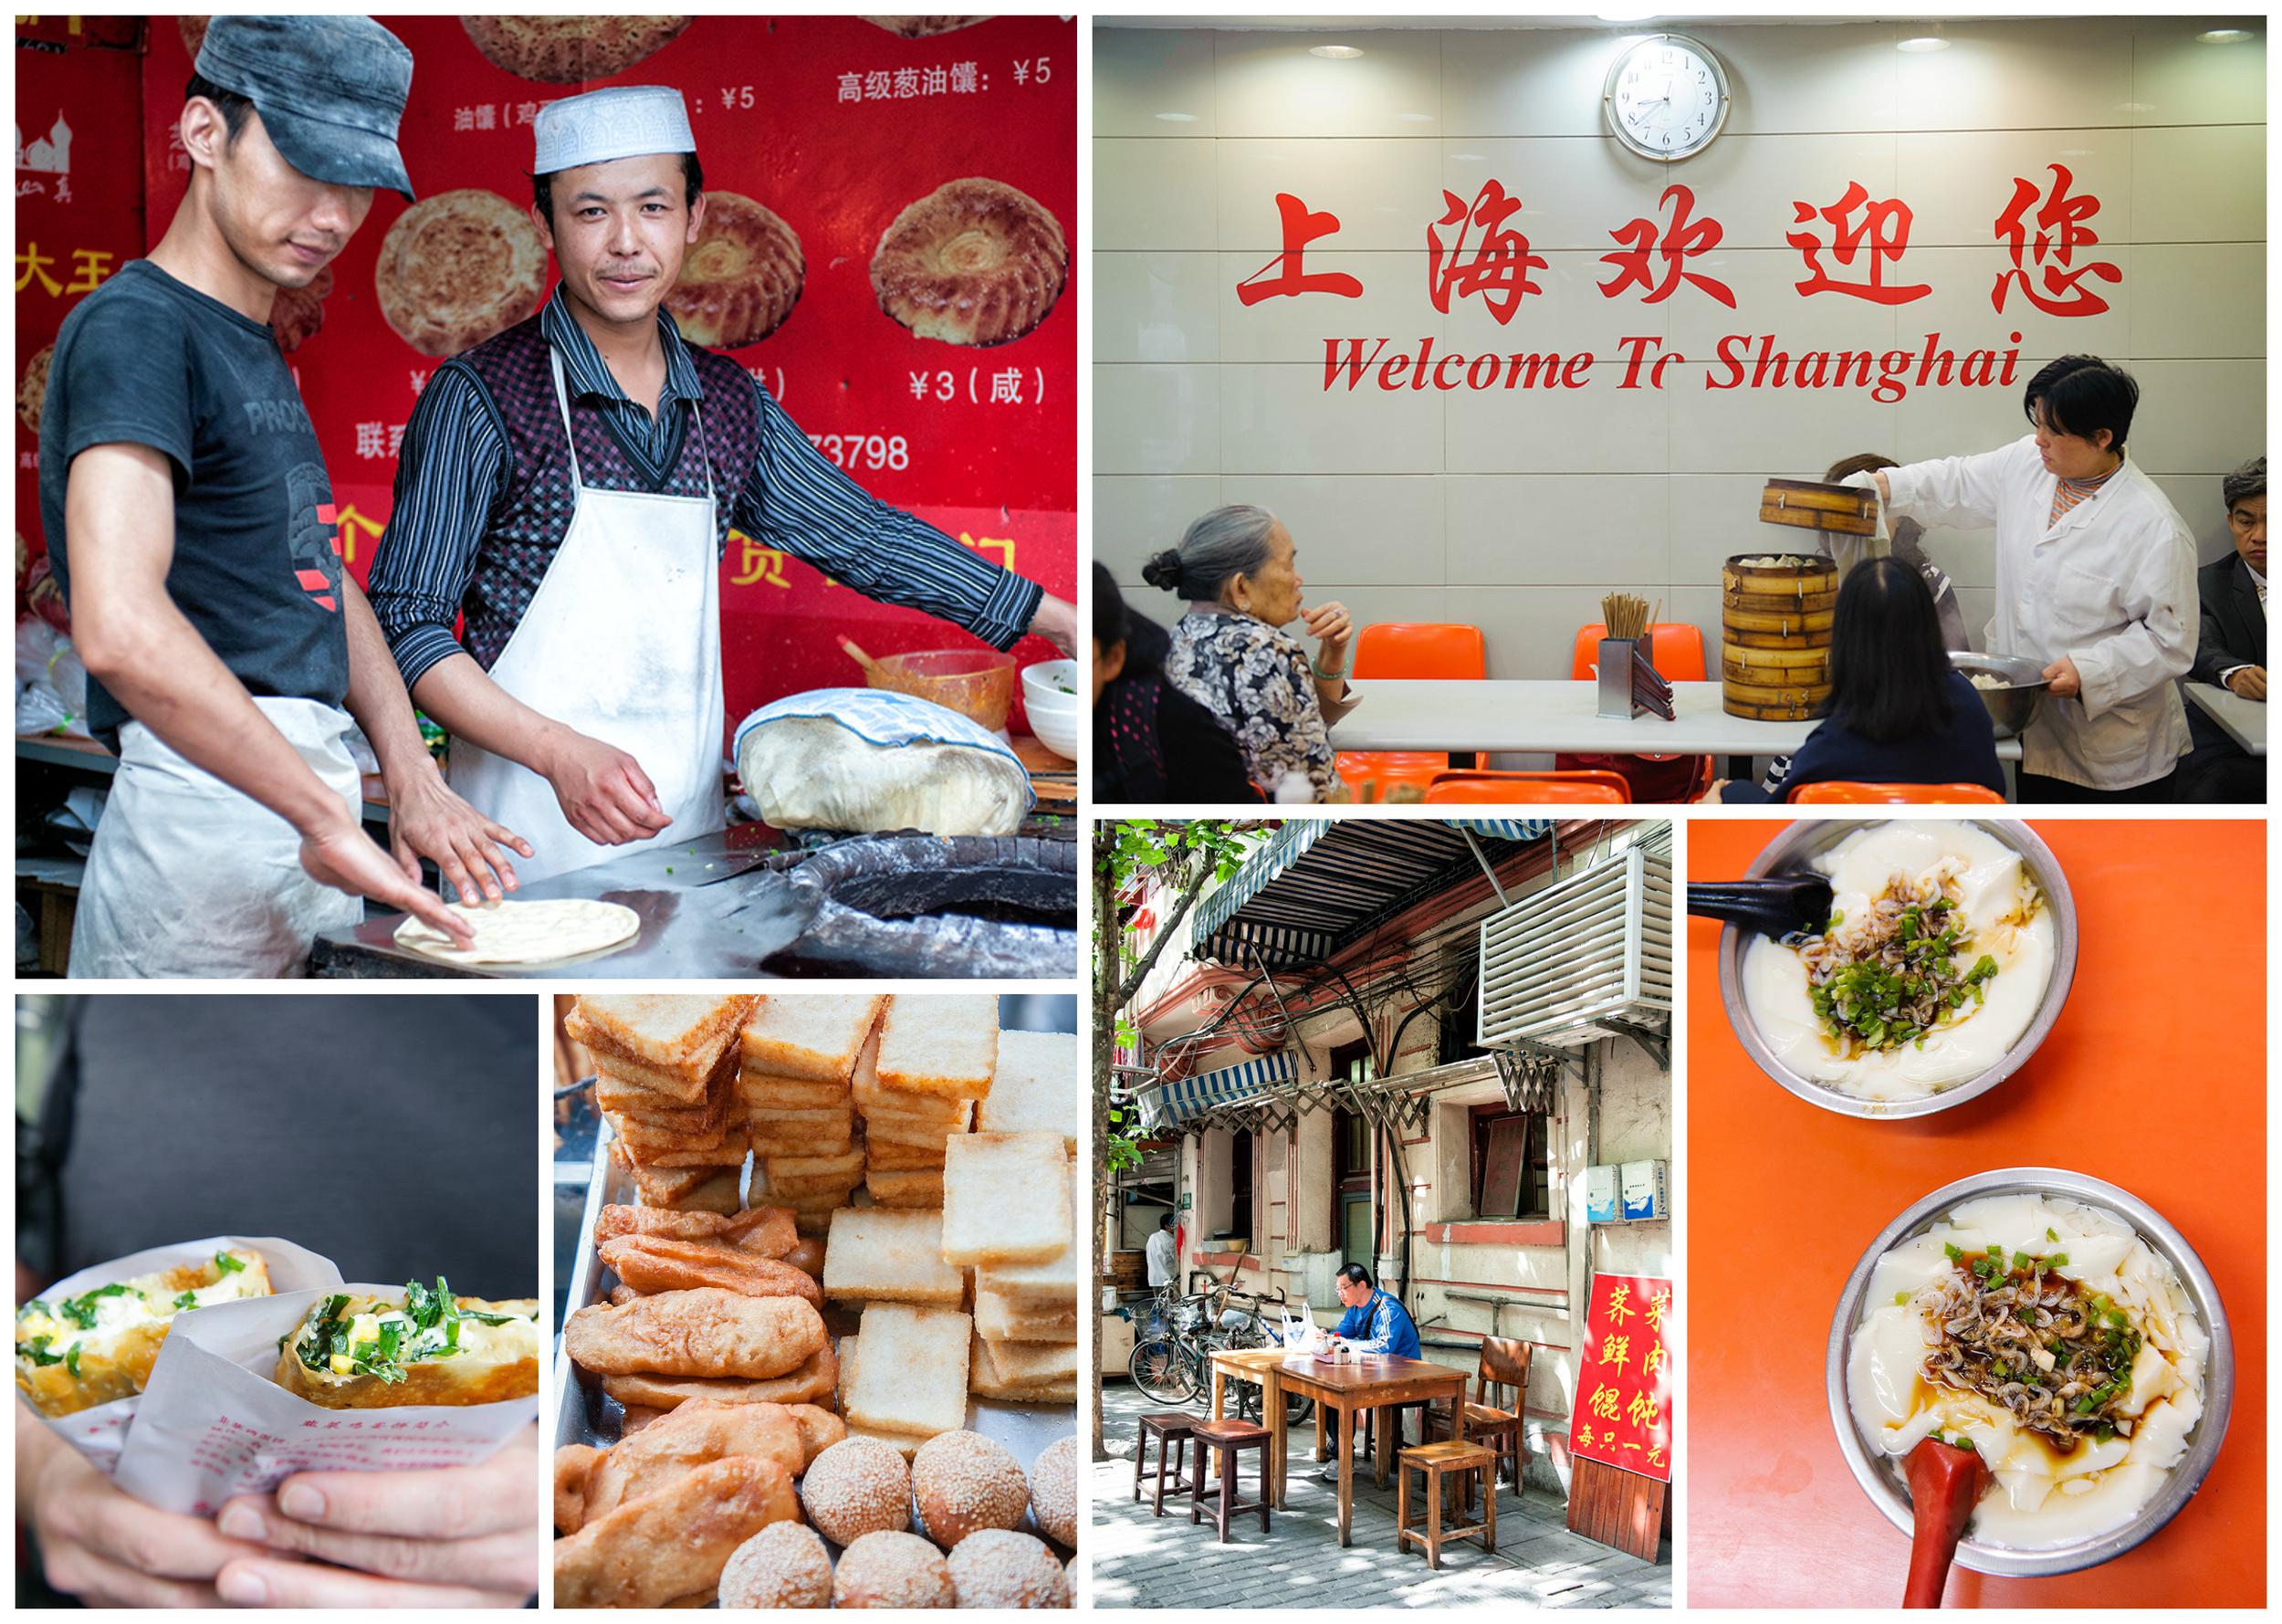 Shanghai snacks and street food